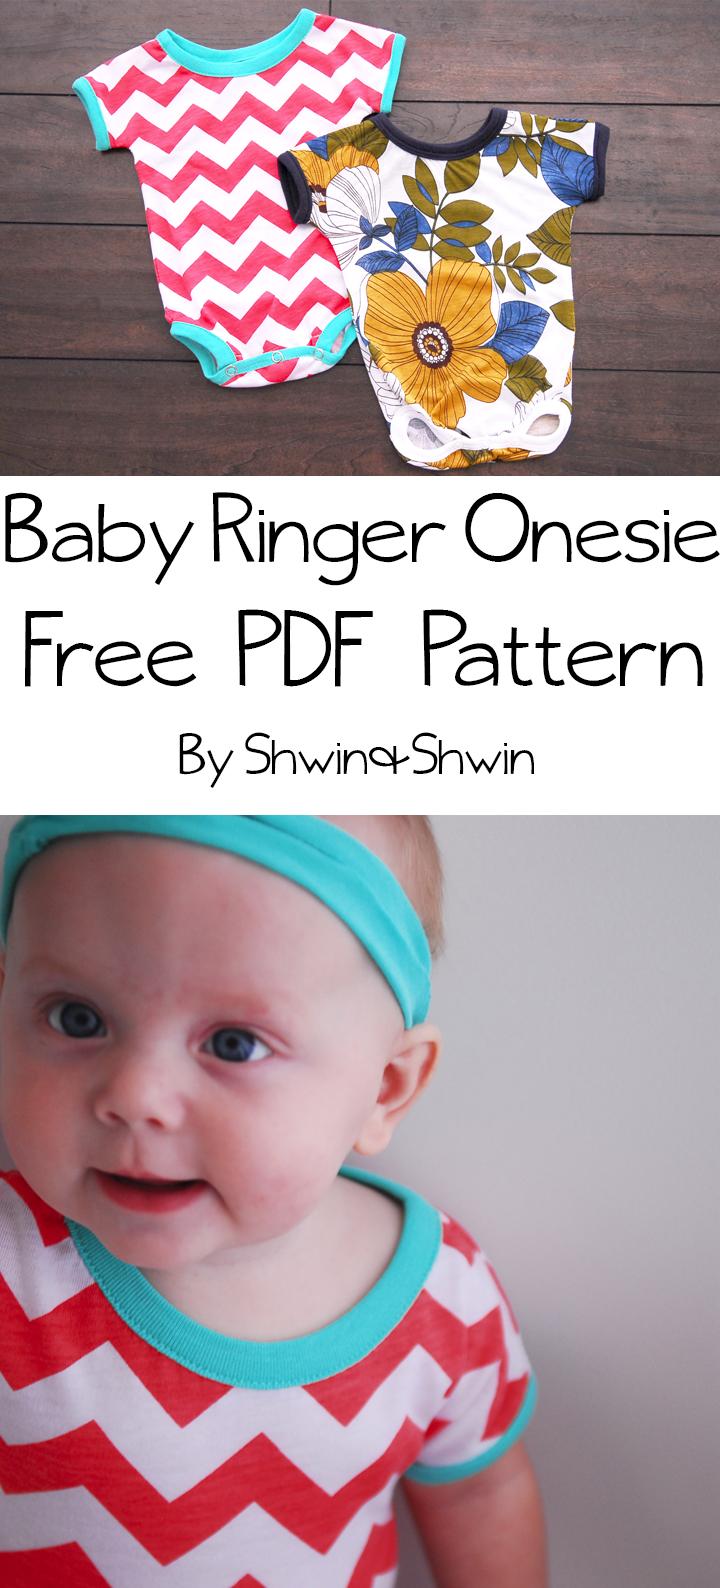 Baby Ringer Onesie || Free PDF Pattern || Shwin&Shwin